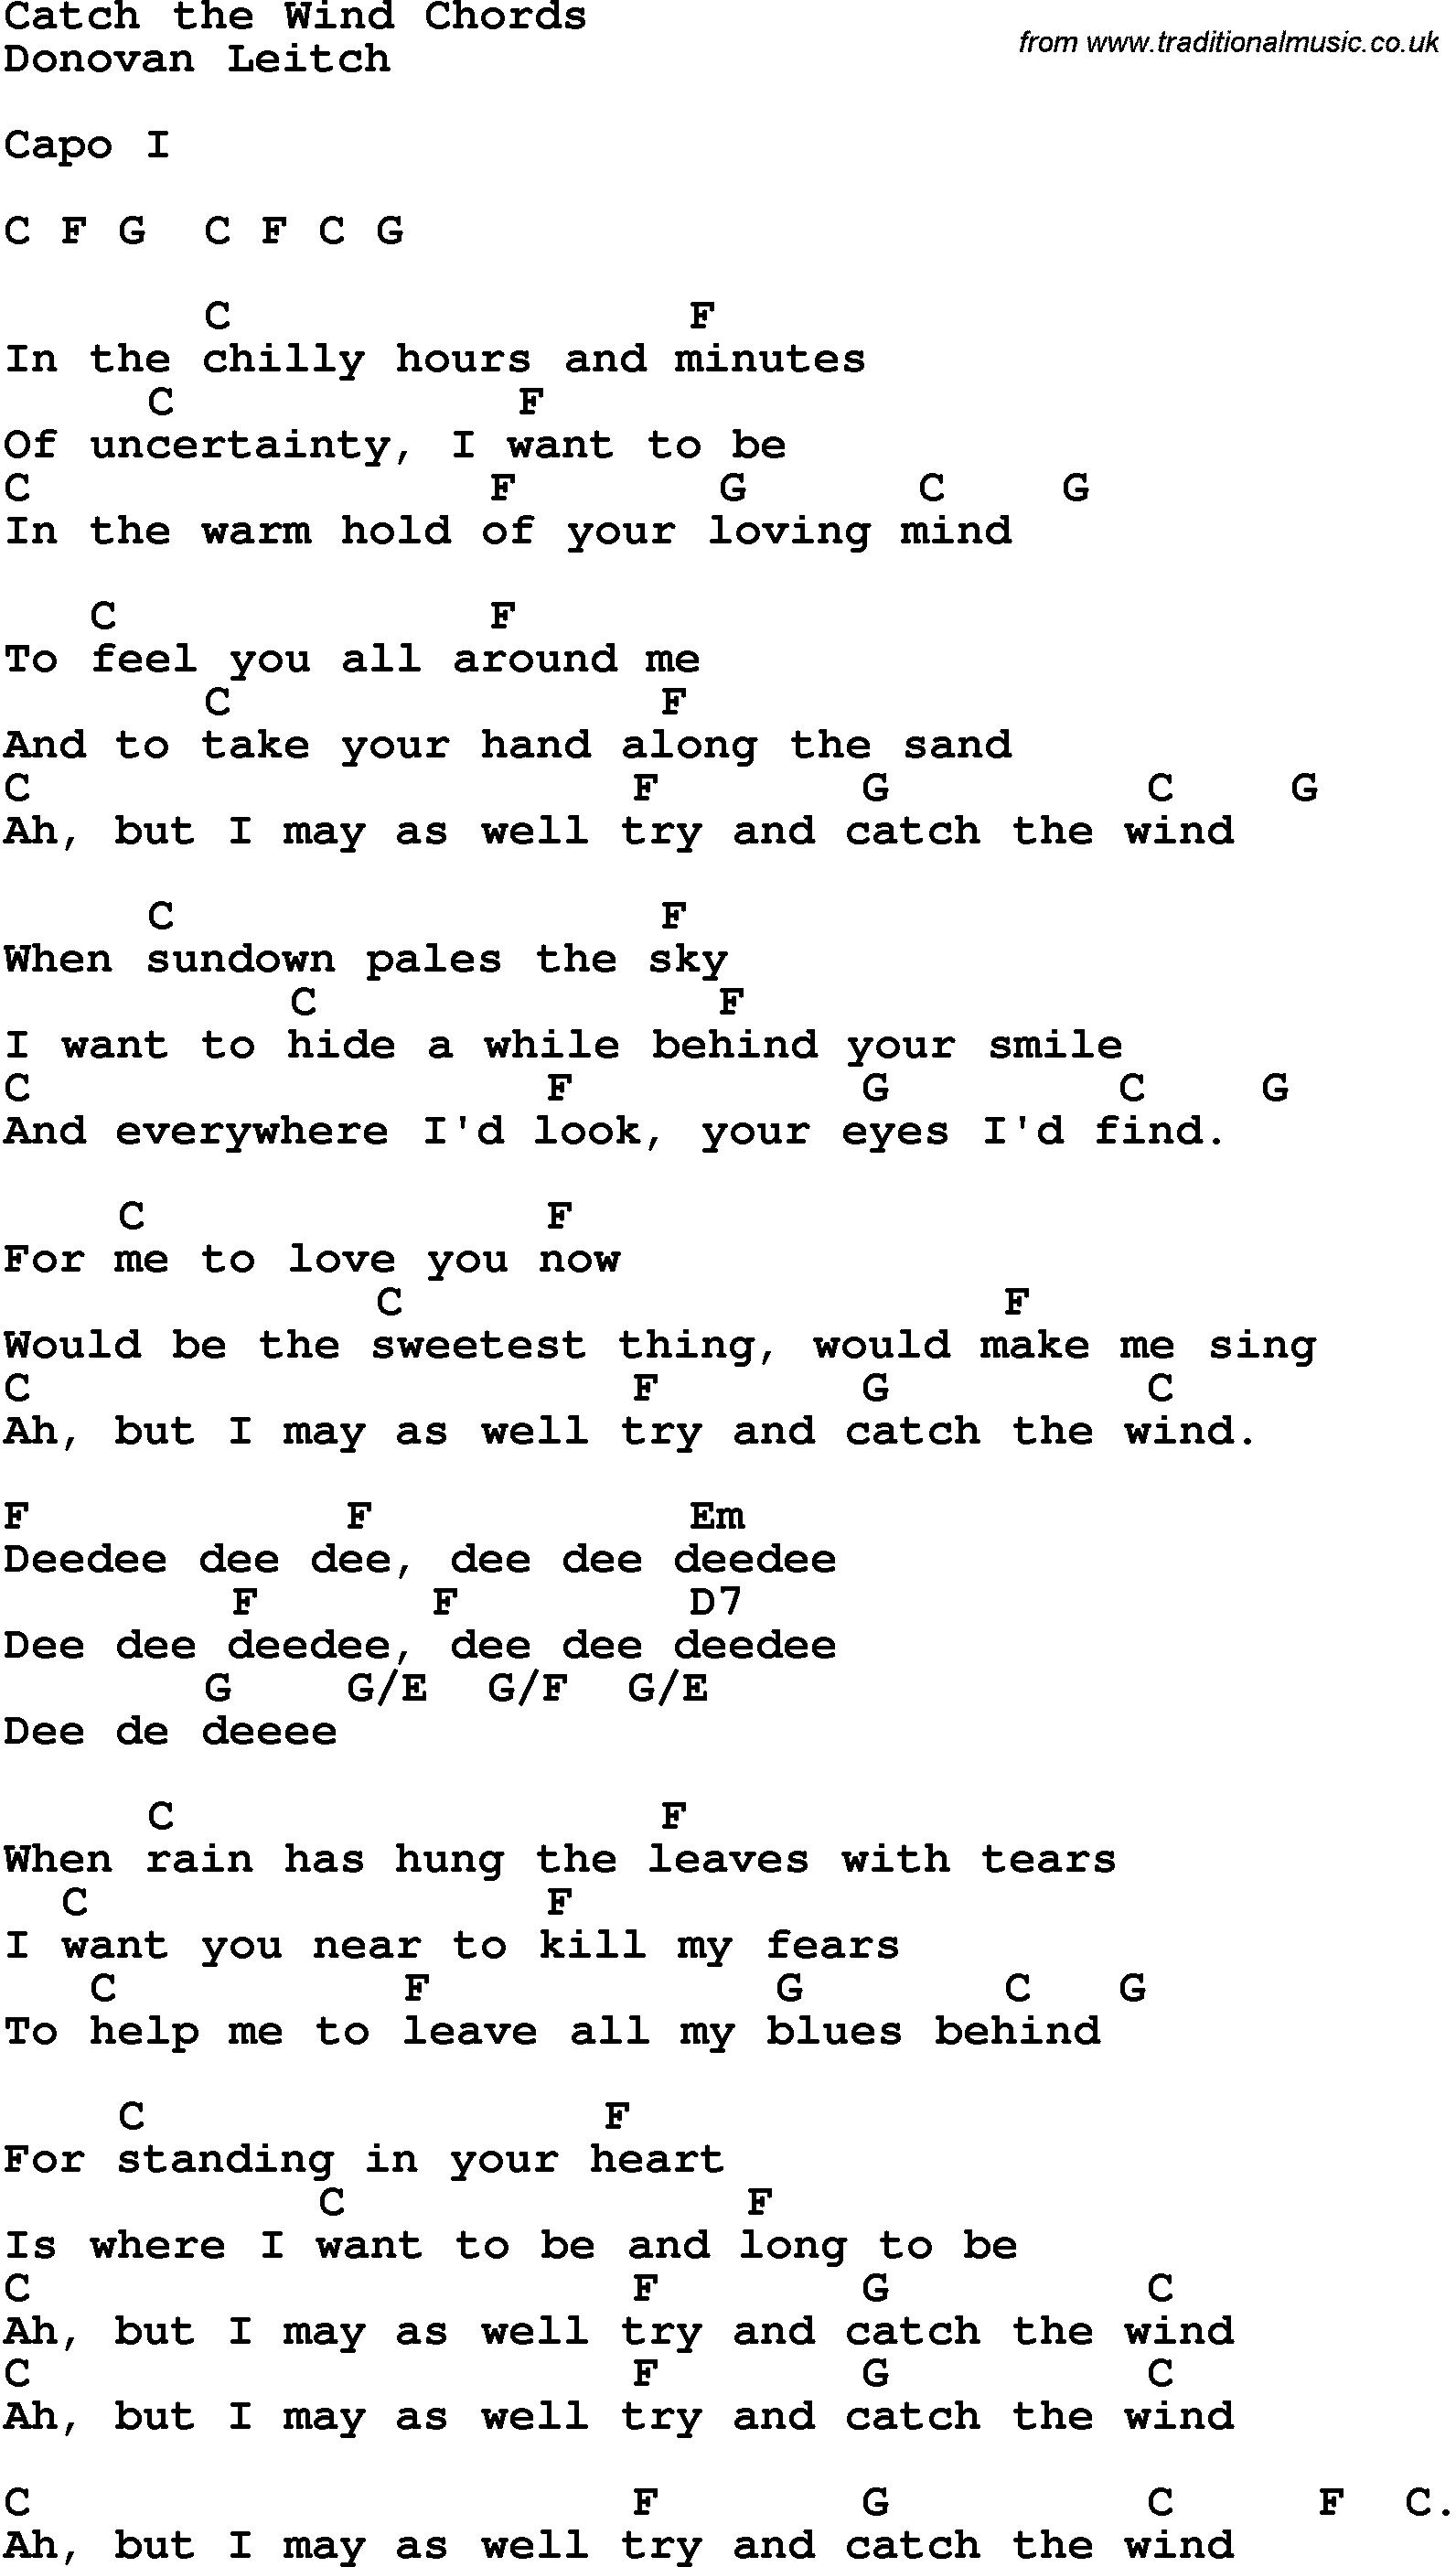 playing in the wind lyrics